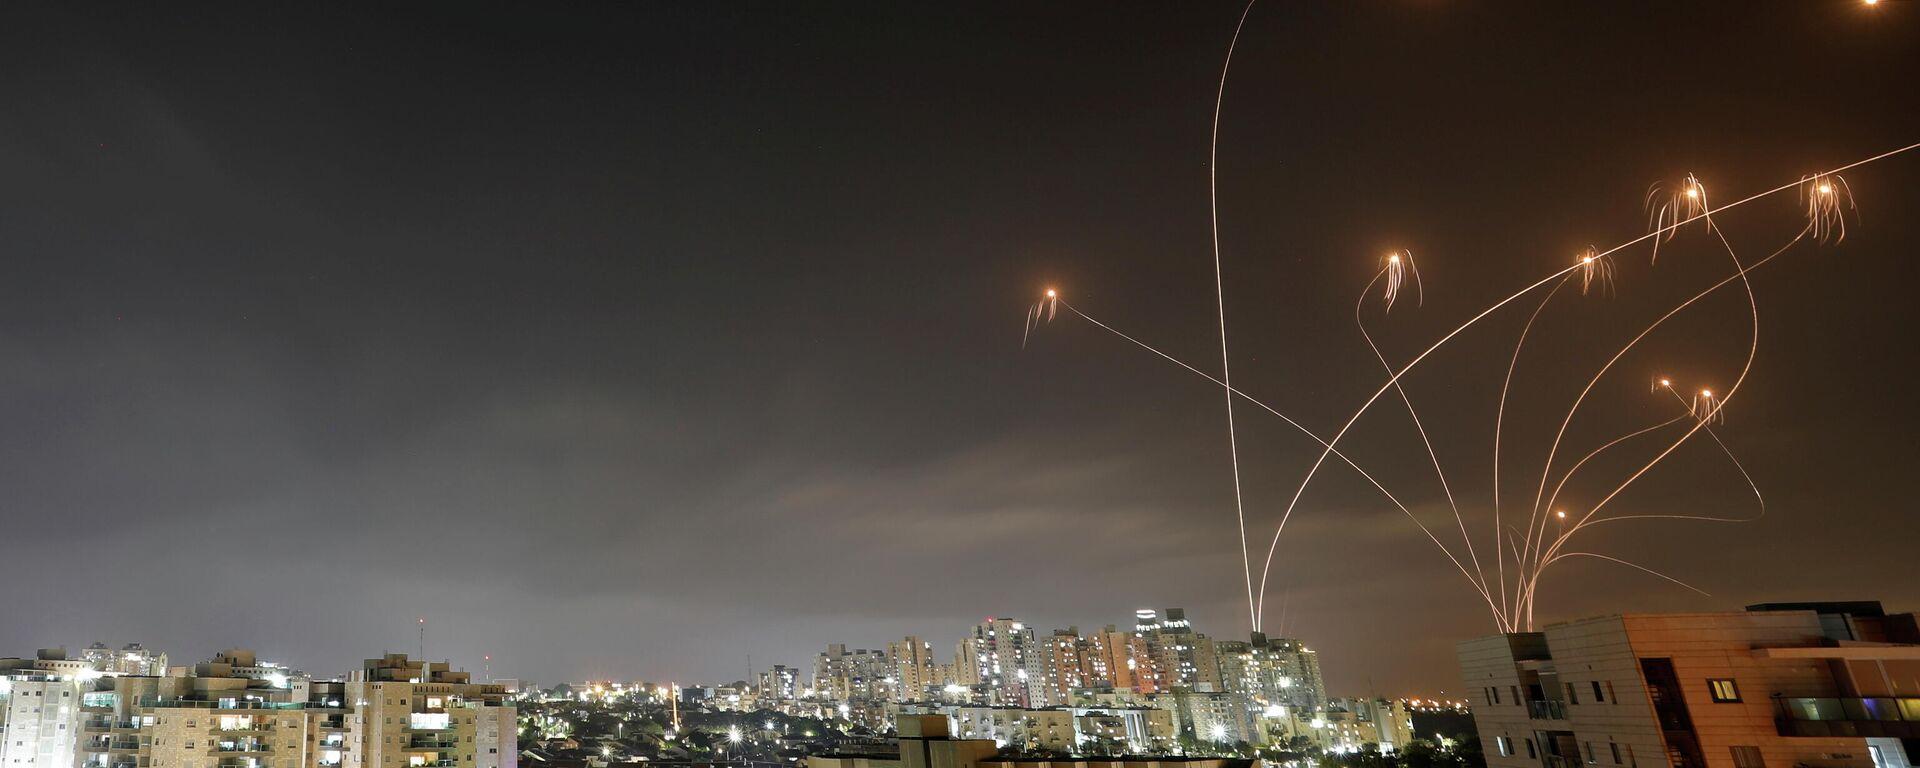 La Cúpula de Hierro israelí intercepta misiles lanzados desde Gaza - Sputnik Mundo, 1920, 10.05.2021